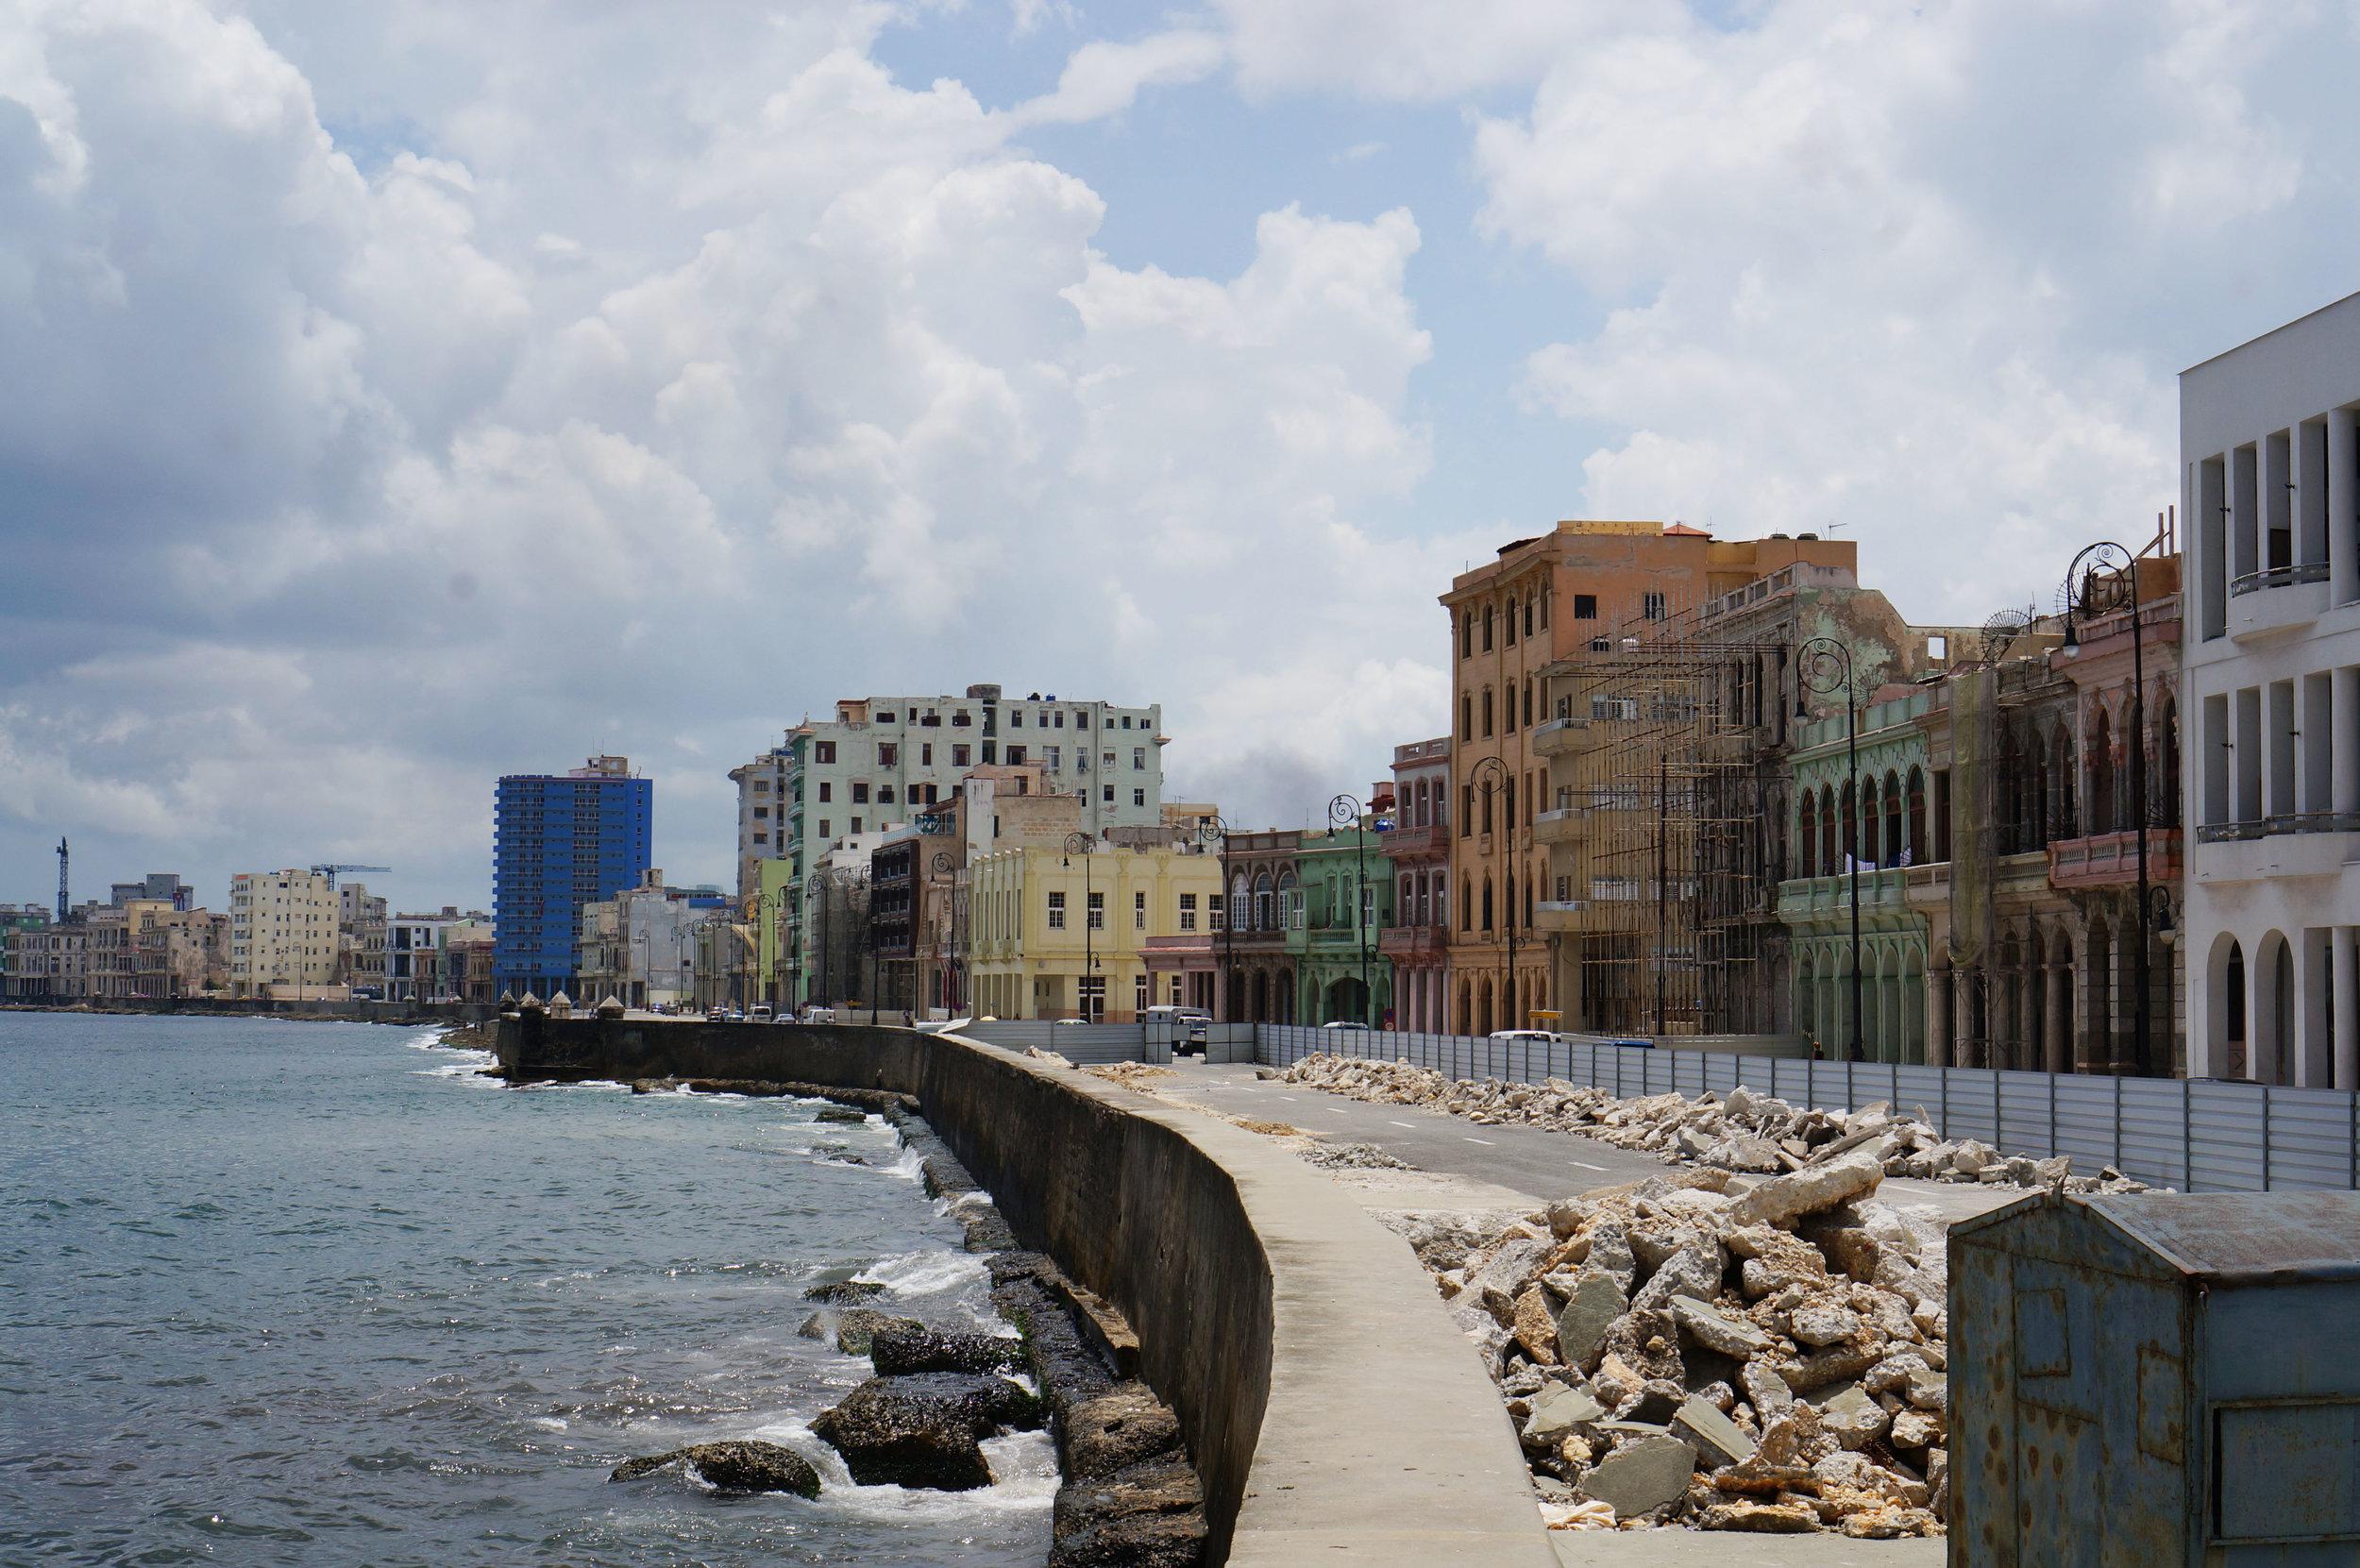 Road construction along the Malecón